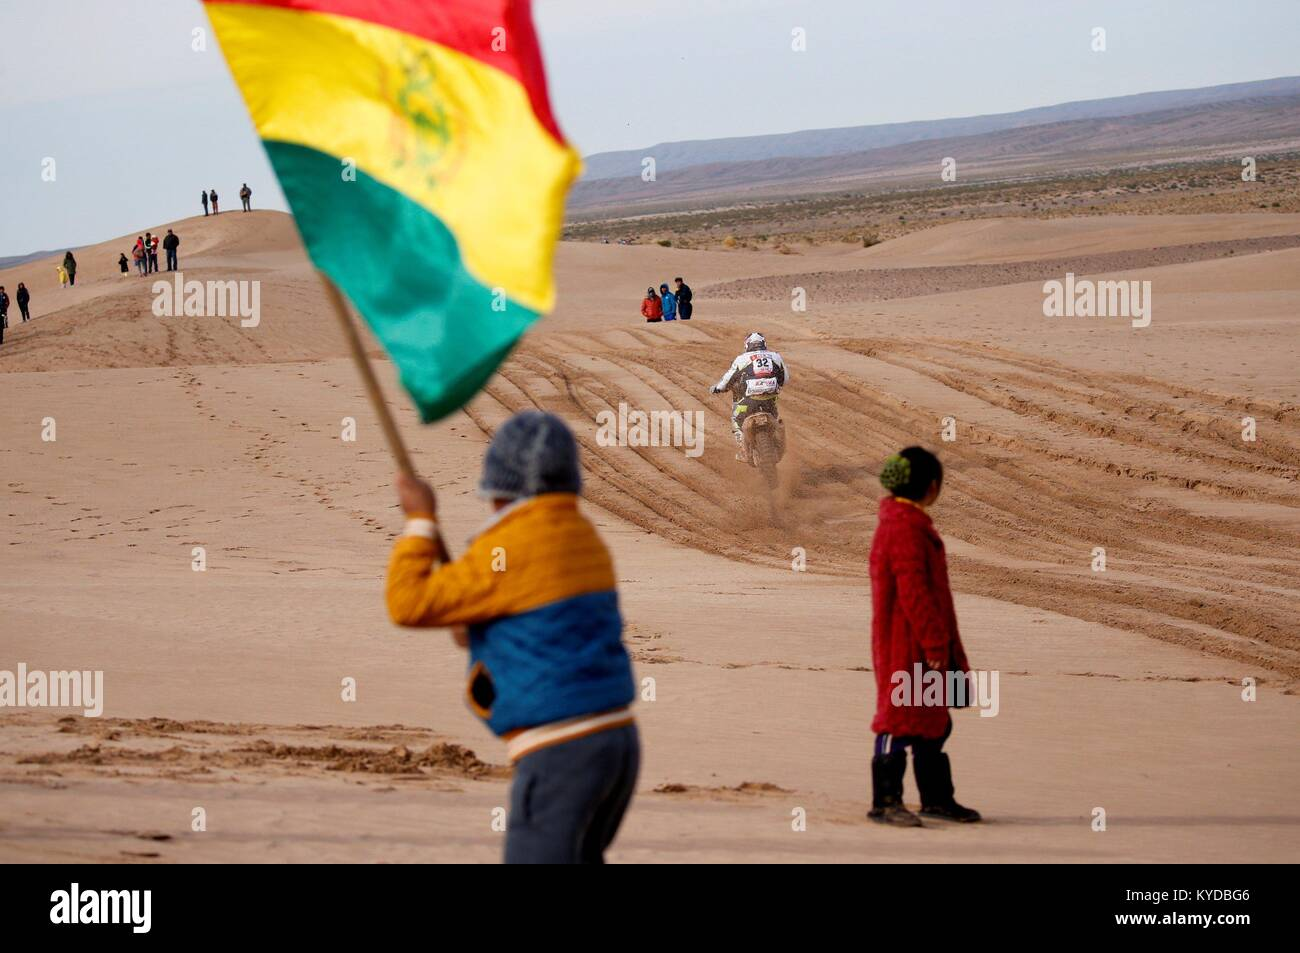 Uyuni, Bolivia. 14th Jan, 2018. Spanish Txomin Arana of Husqvarna competes during the eighth stage of the 2018 Dakar - Stock Image